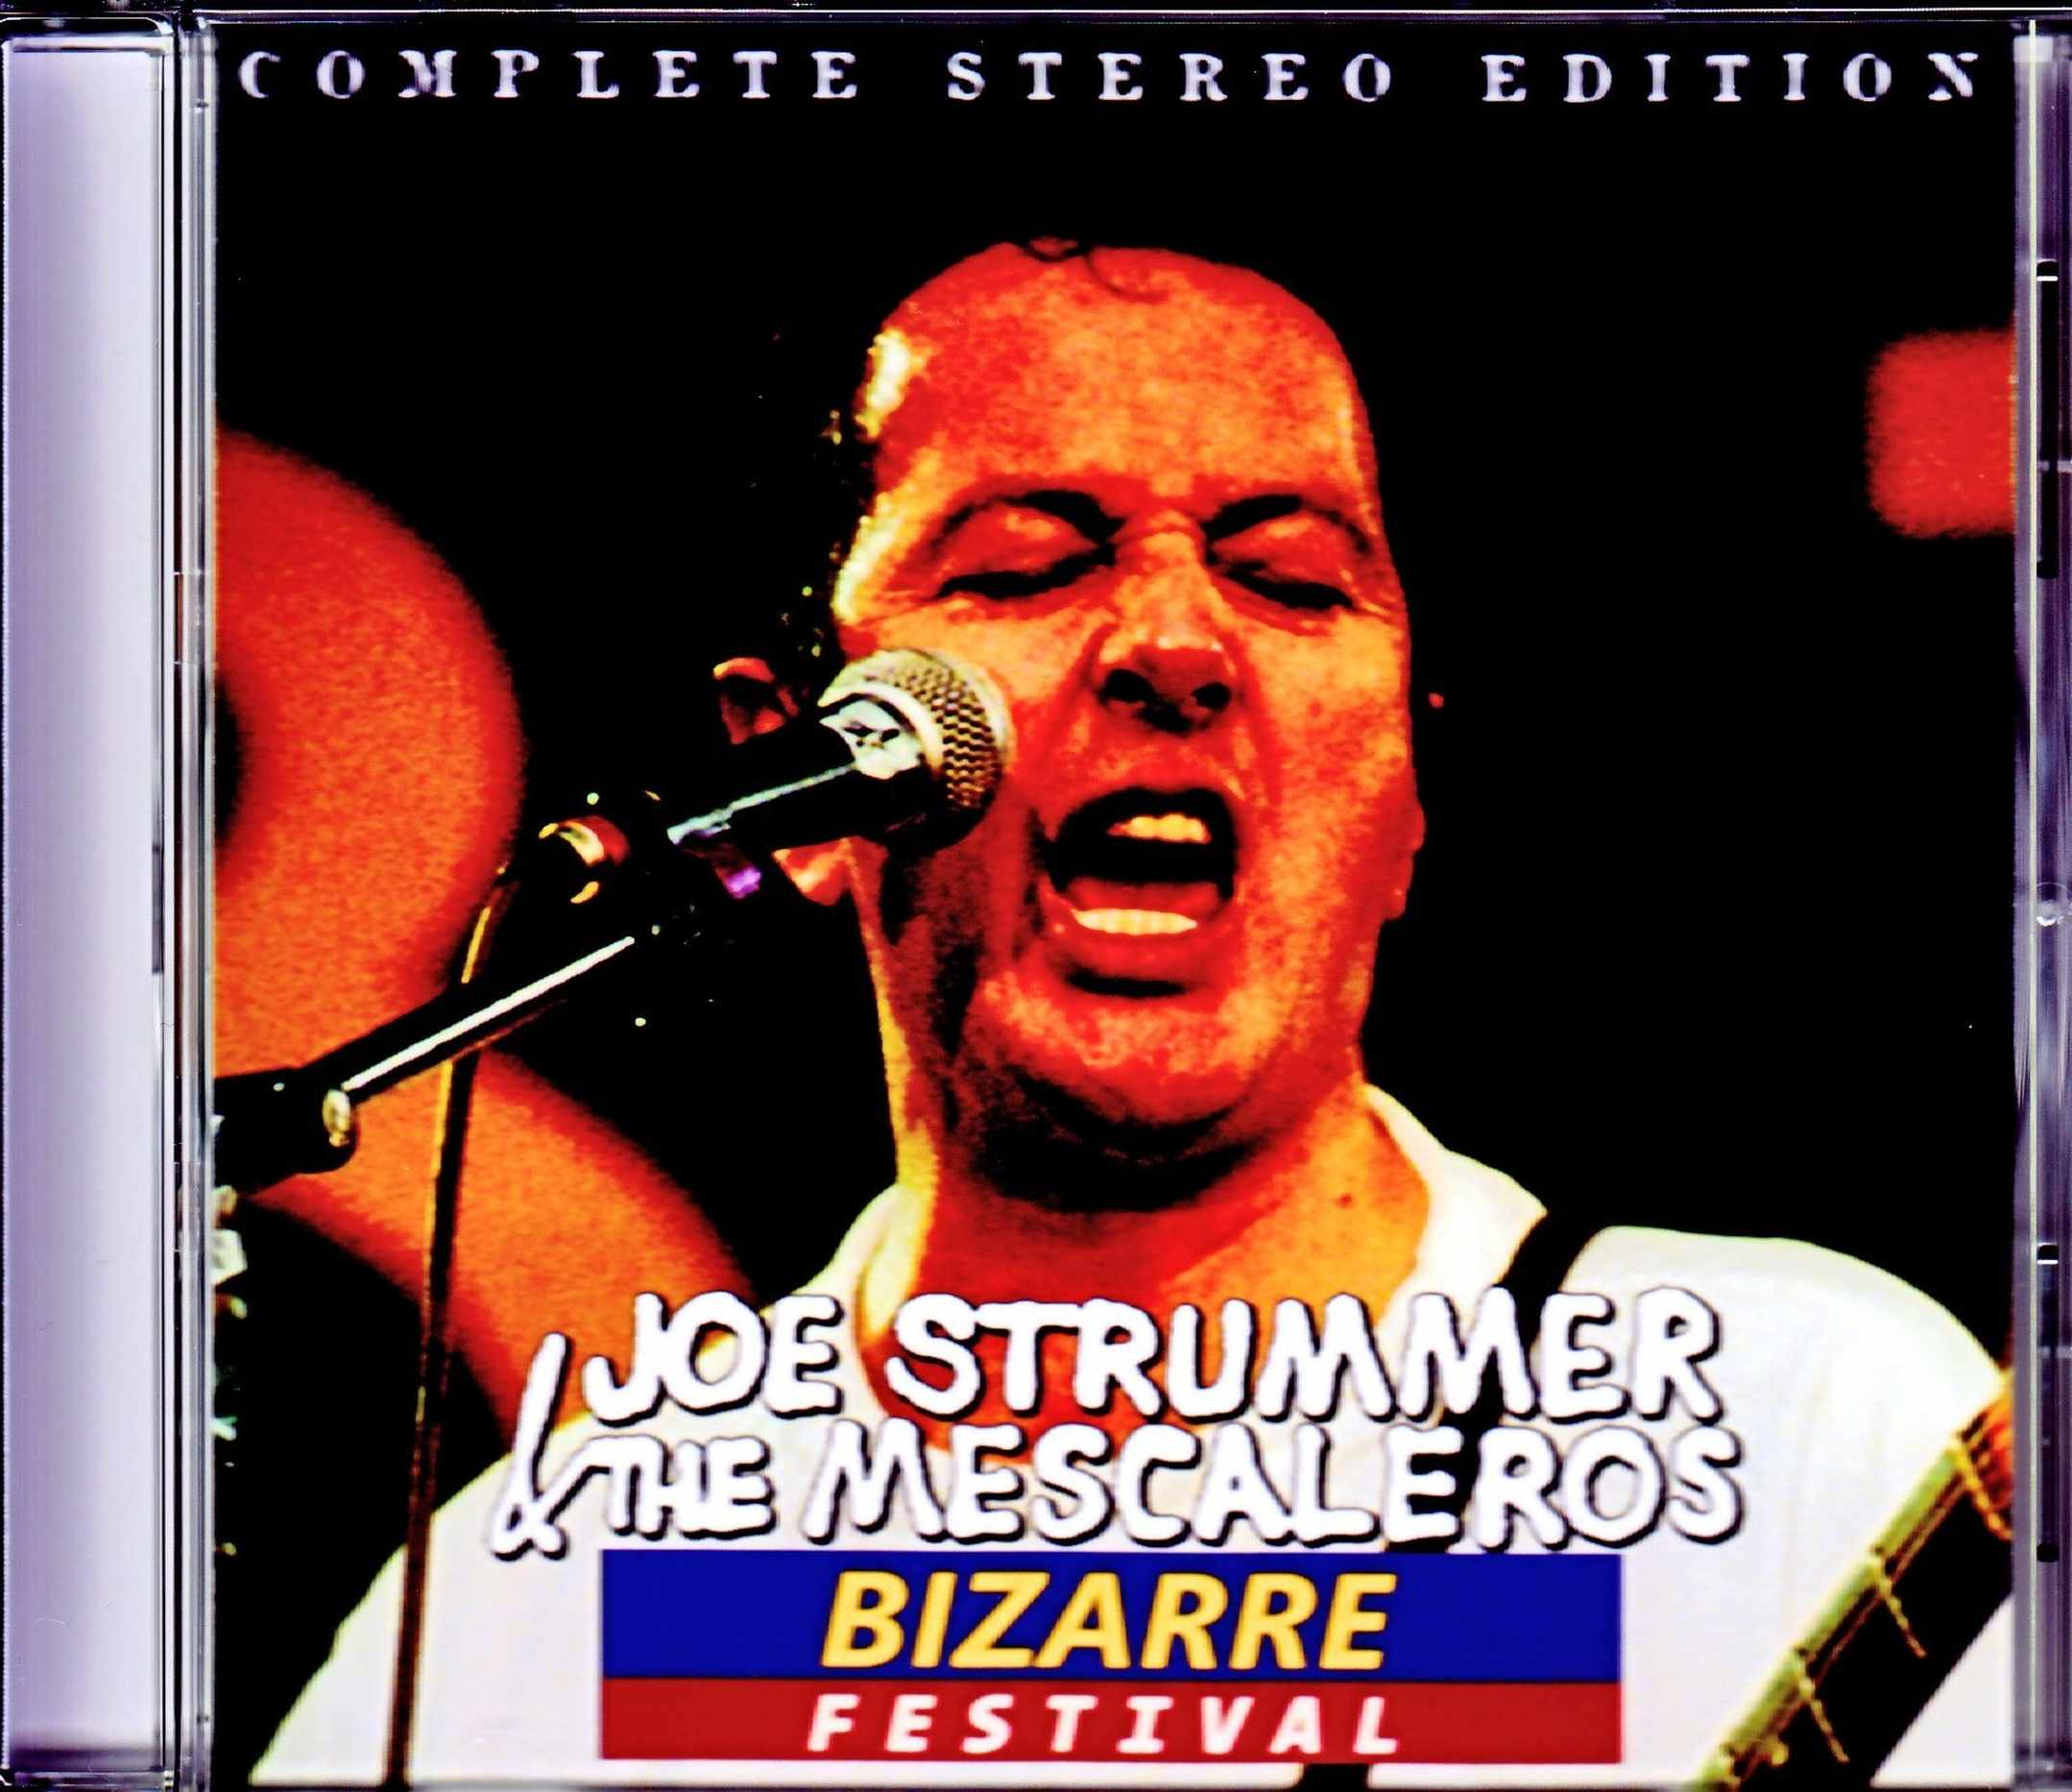 Joe Strummer & the Mescaleros ジョー・ストラマー/Germany 1999